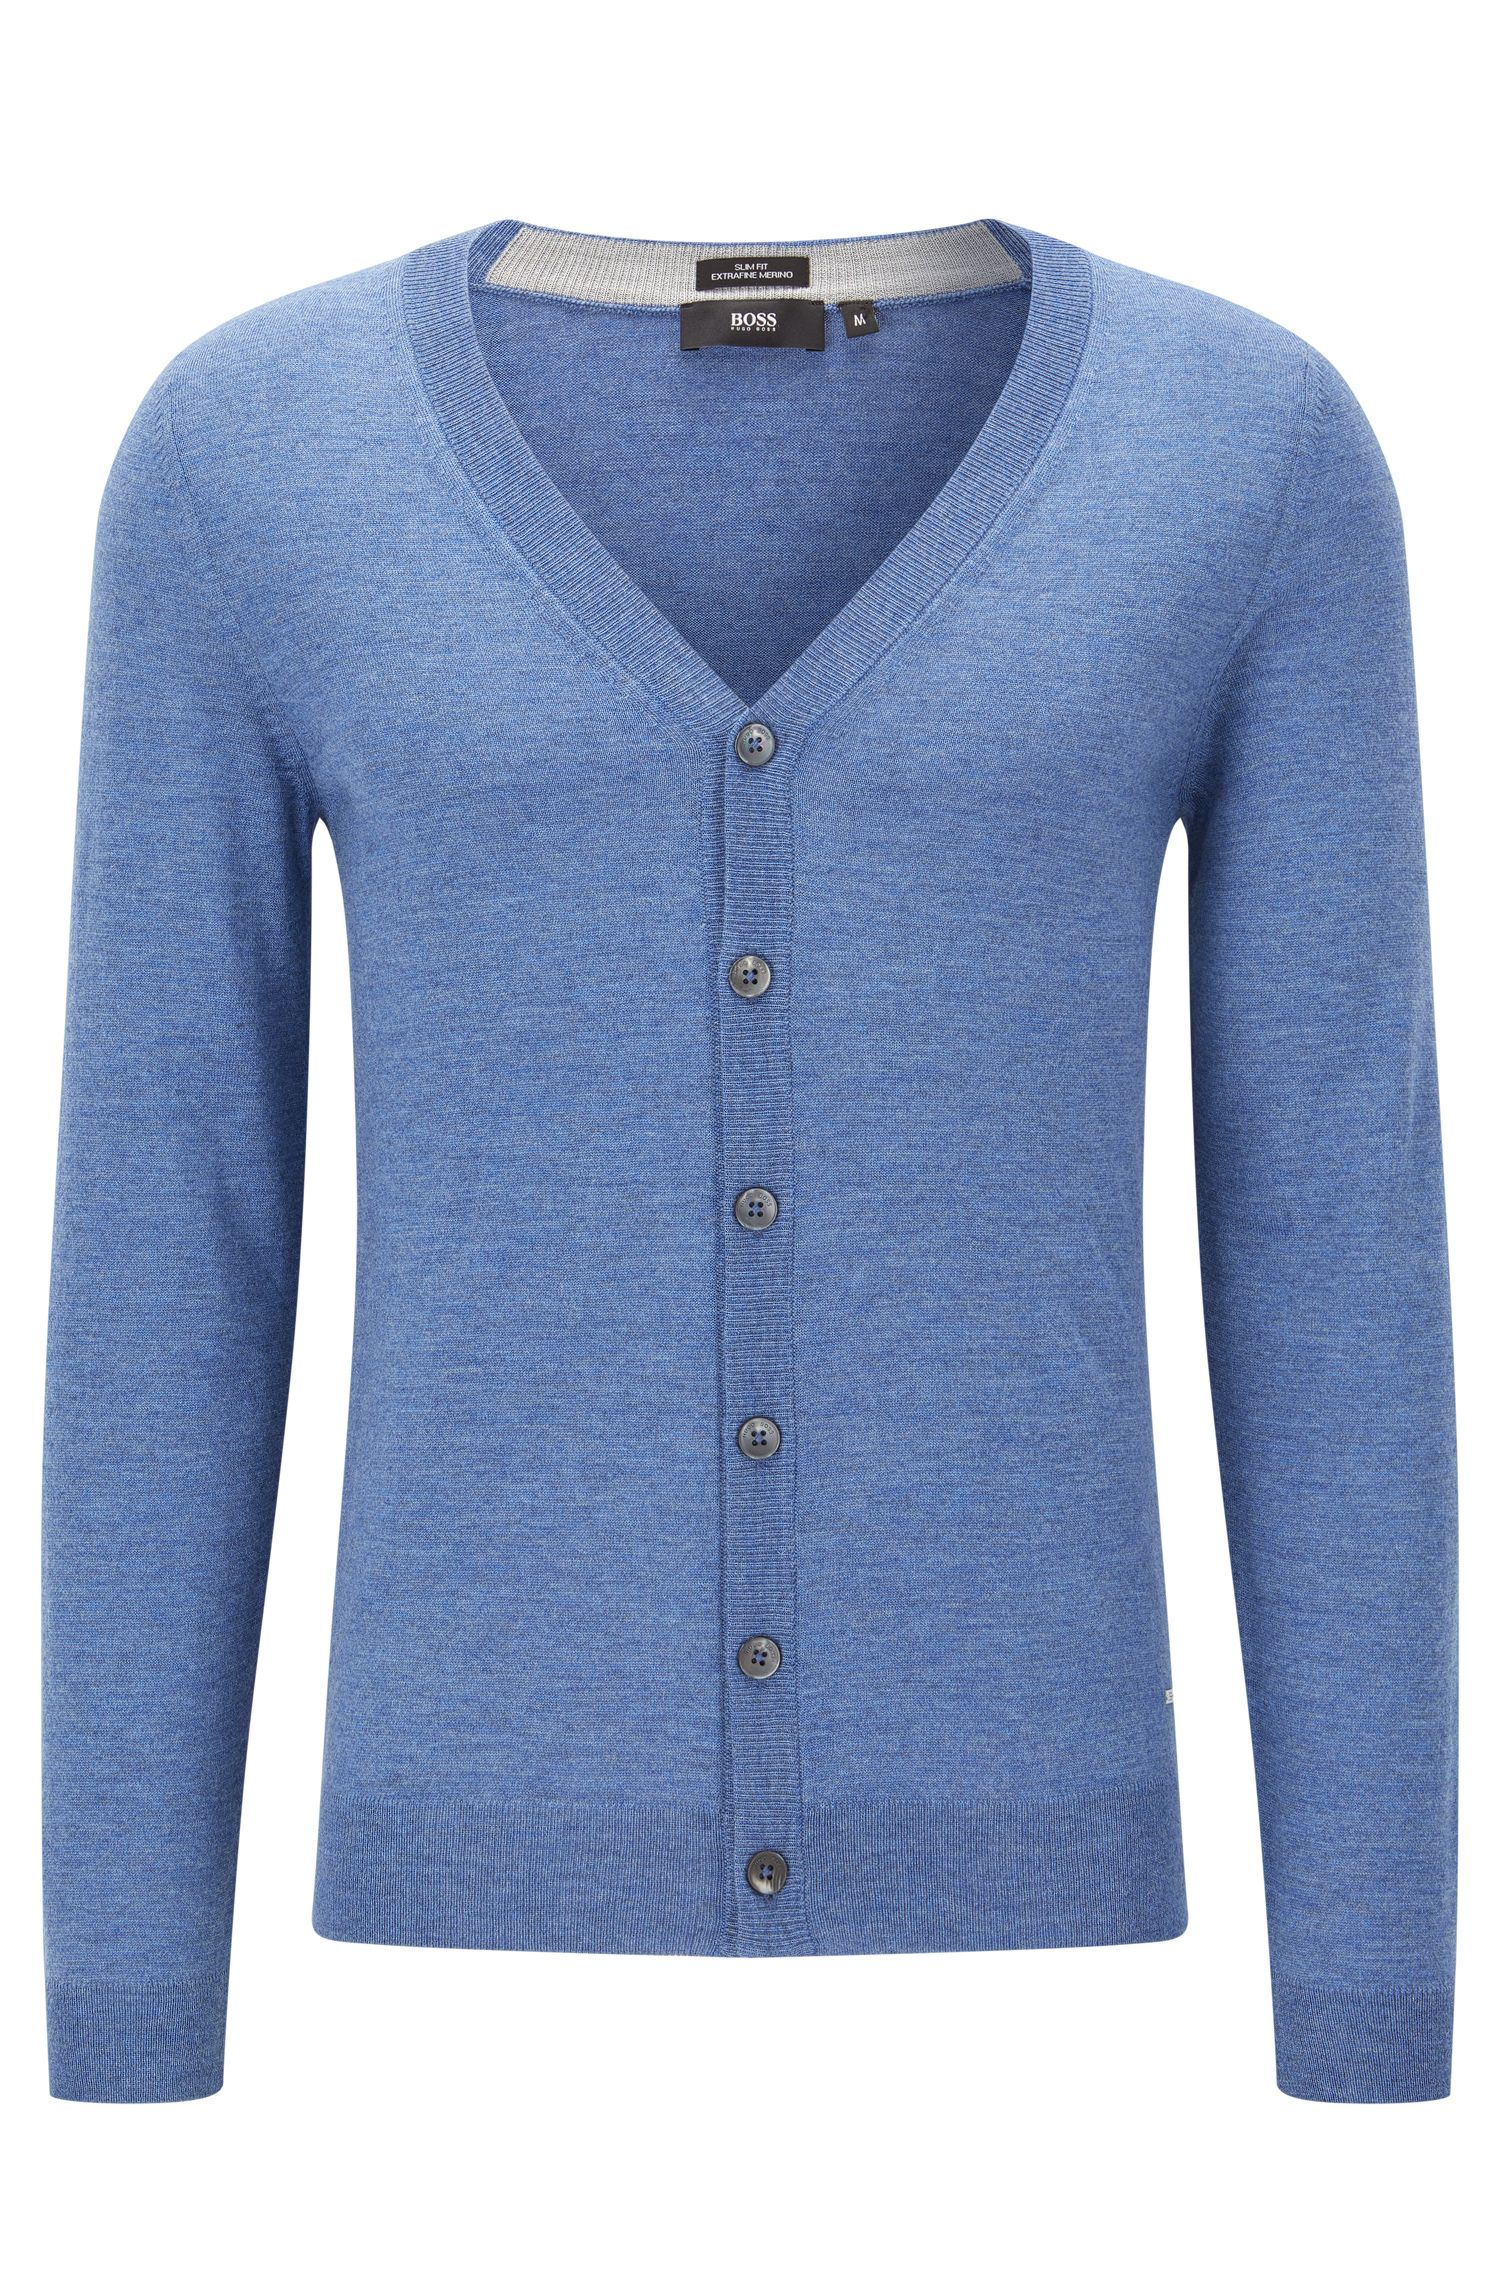 'Mardon-M' | Slim Fit, Extra-Fine Virgin Merino Wool Sweater